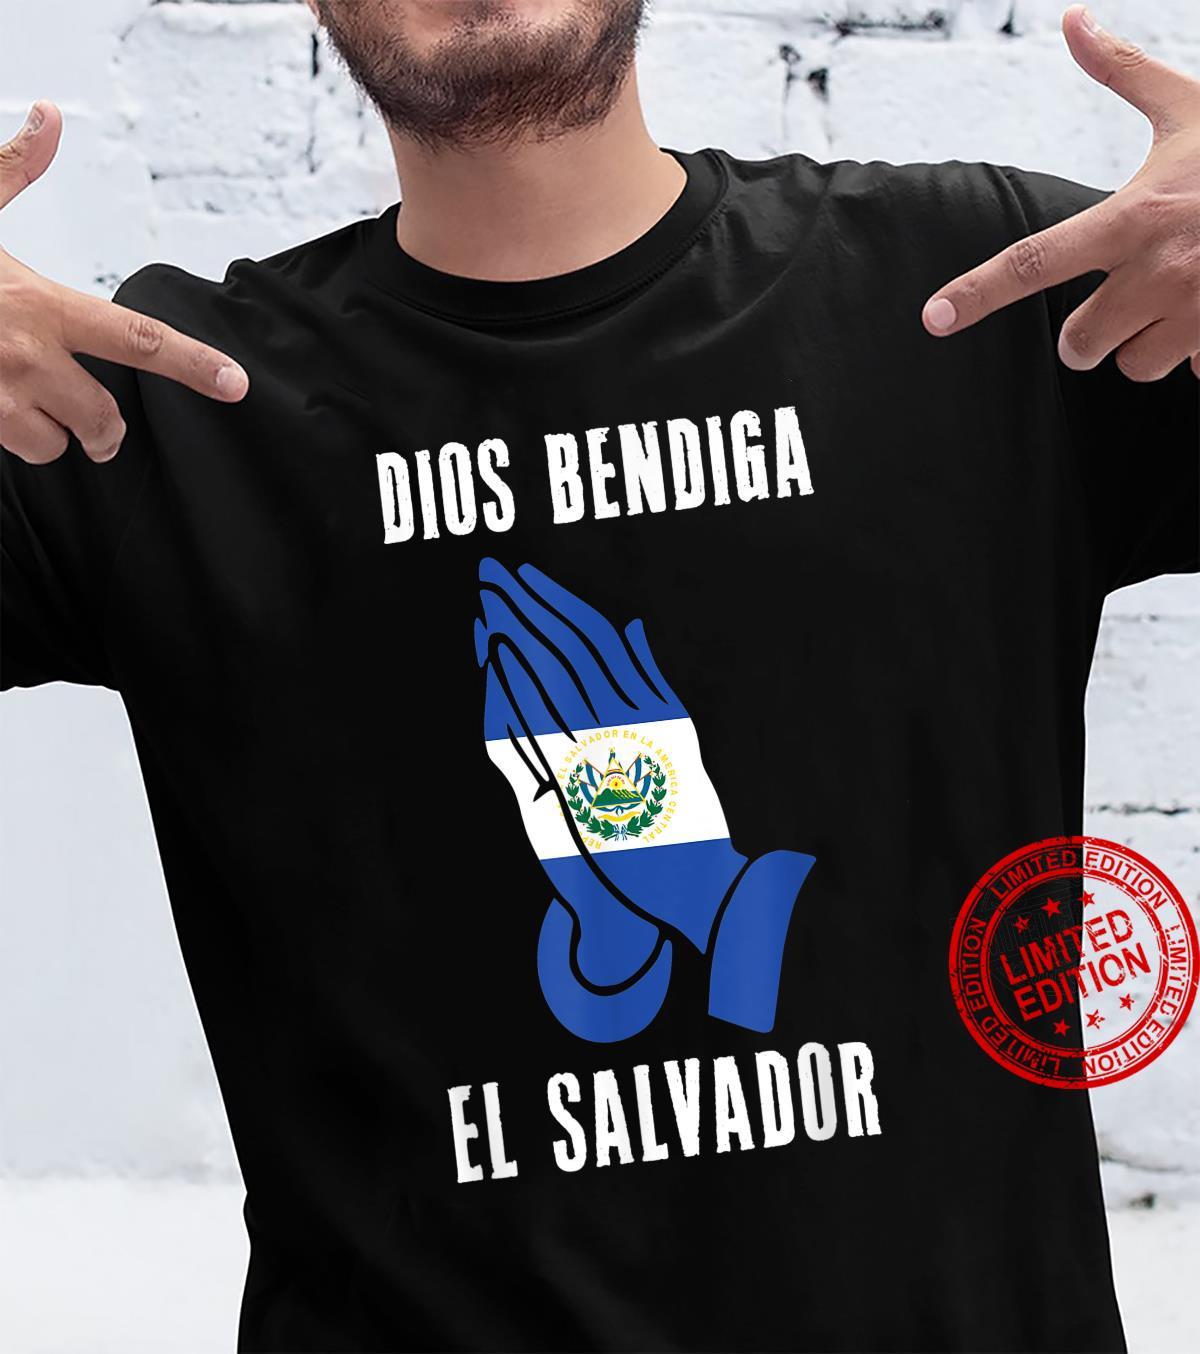 El Salvador Dios Bendiga Pupusas Salvadoreno Bukele Idea God Shirt